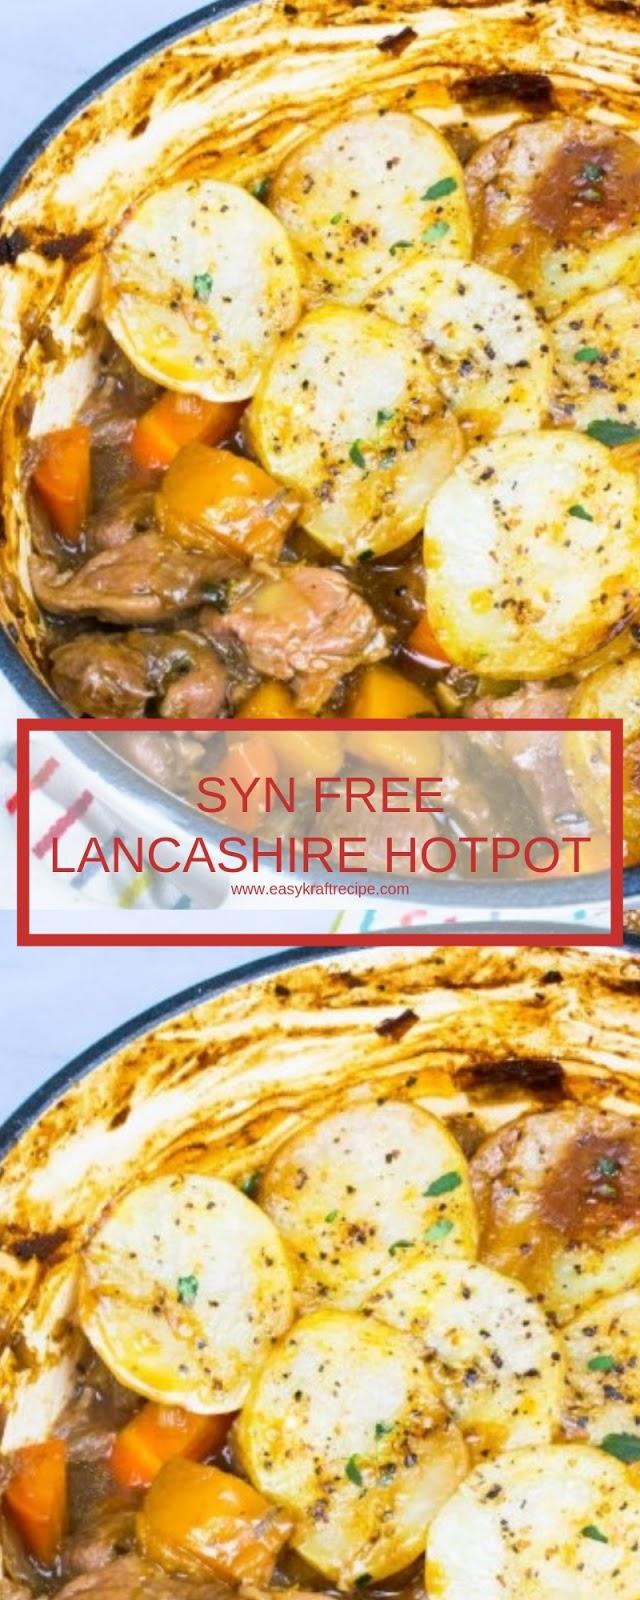 SYN FREE LANCASHIRE HOTPOT